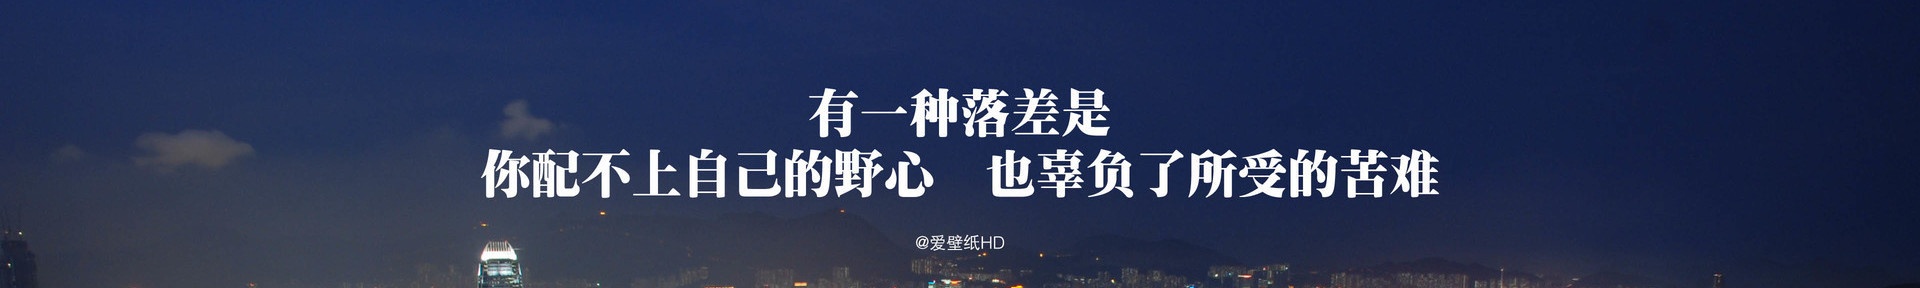 Merida视频 banner